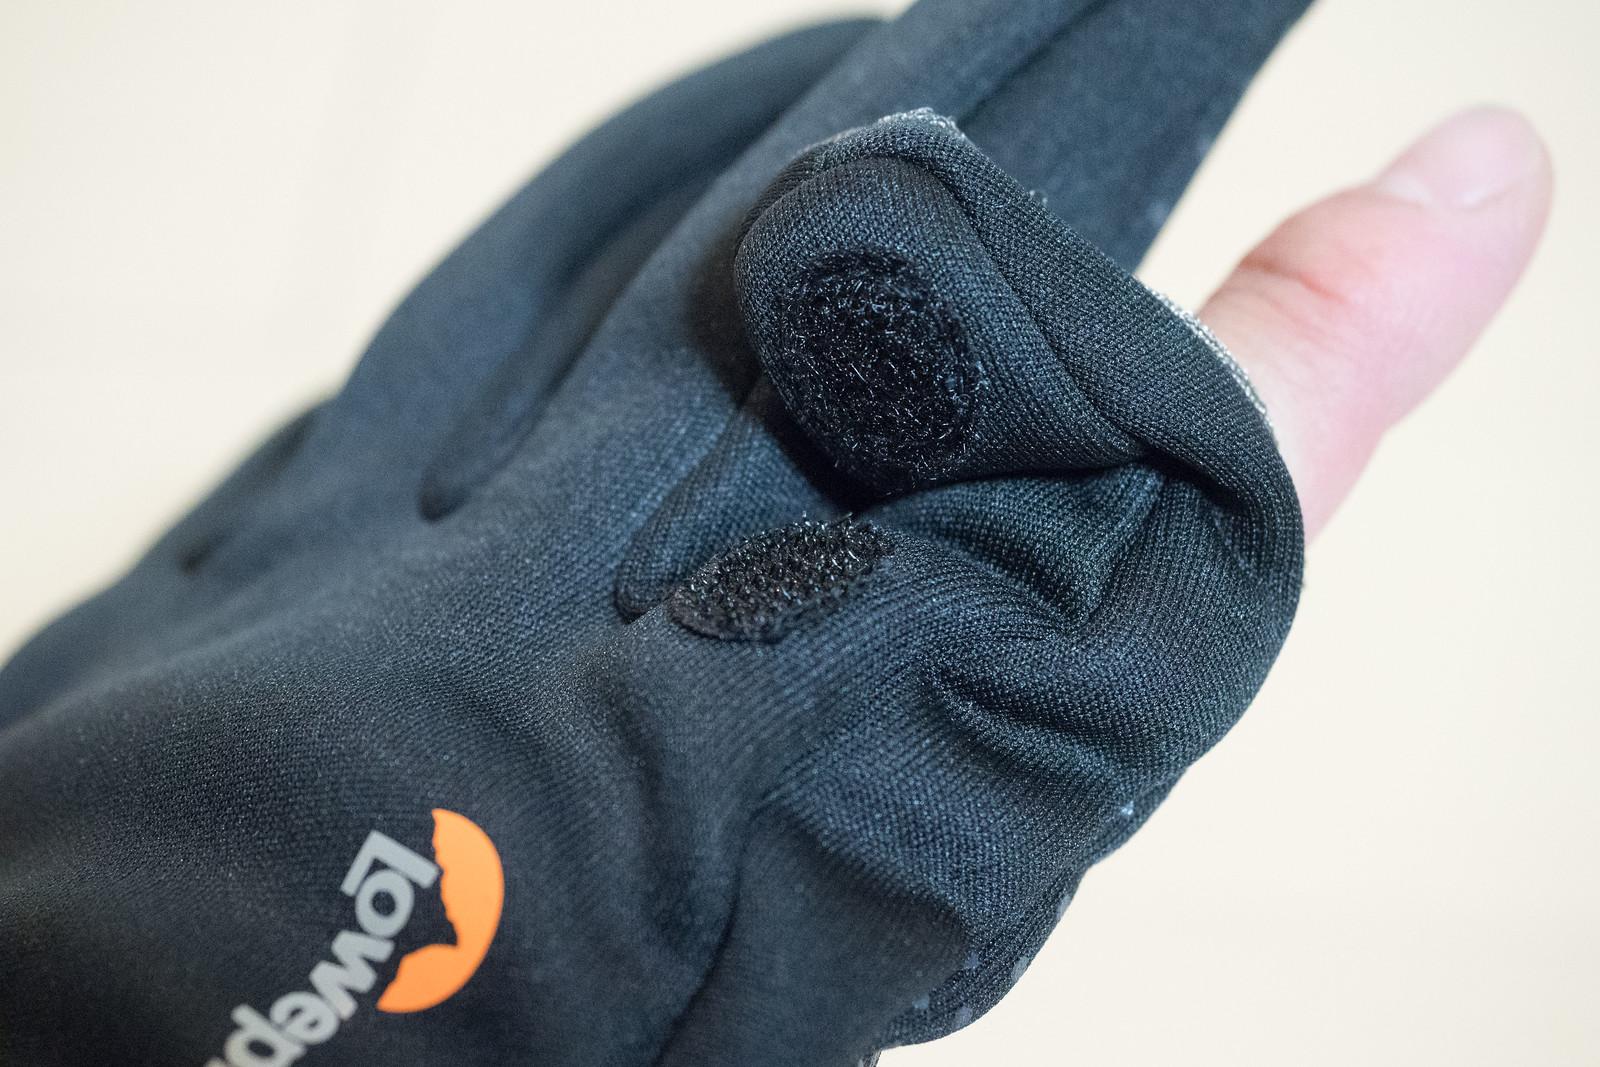 LowePro_Photo_Glove-9